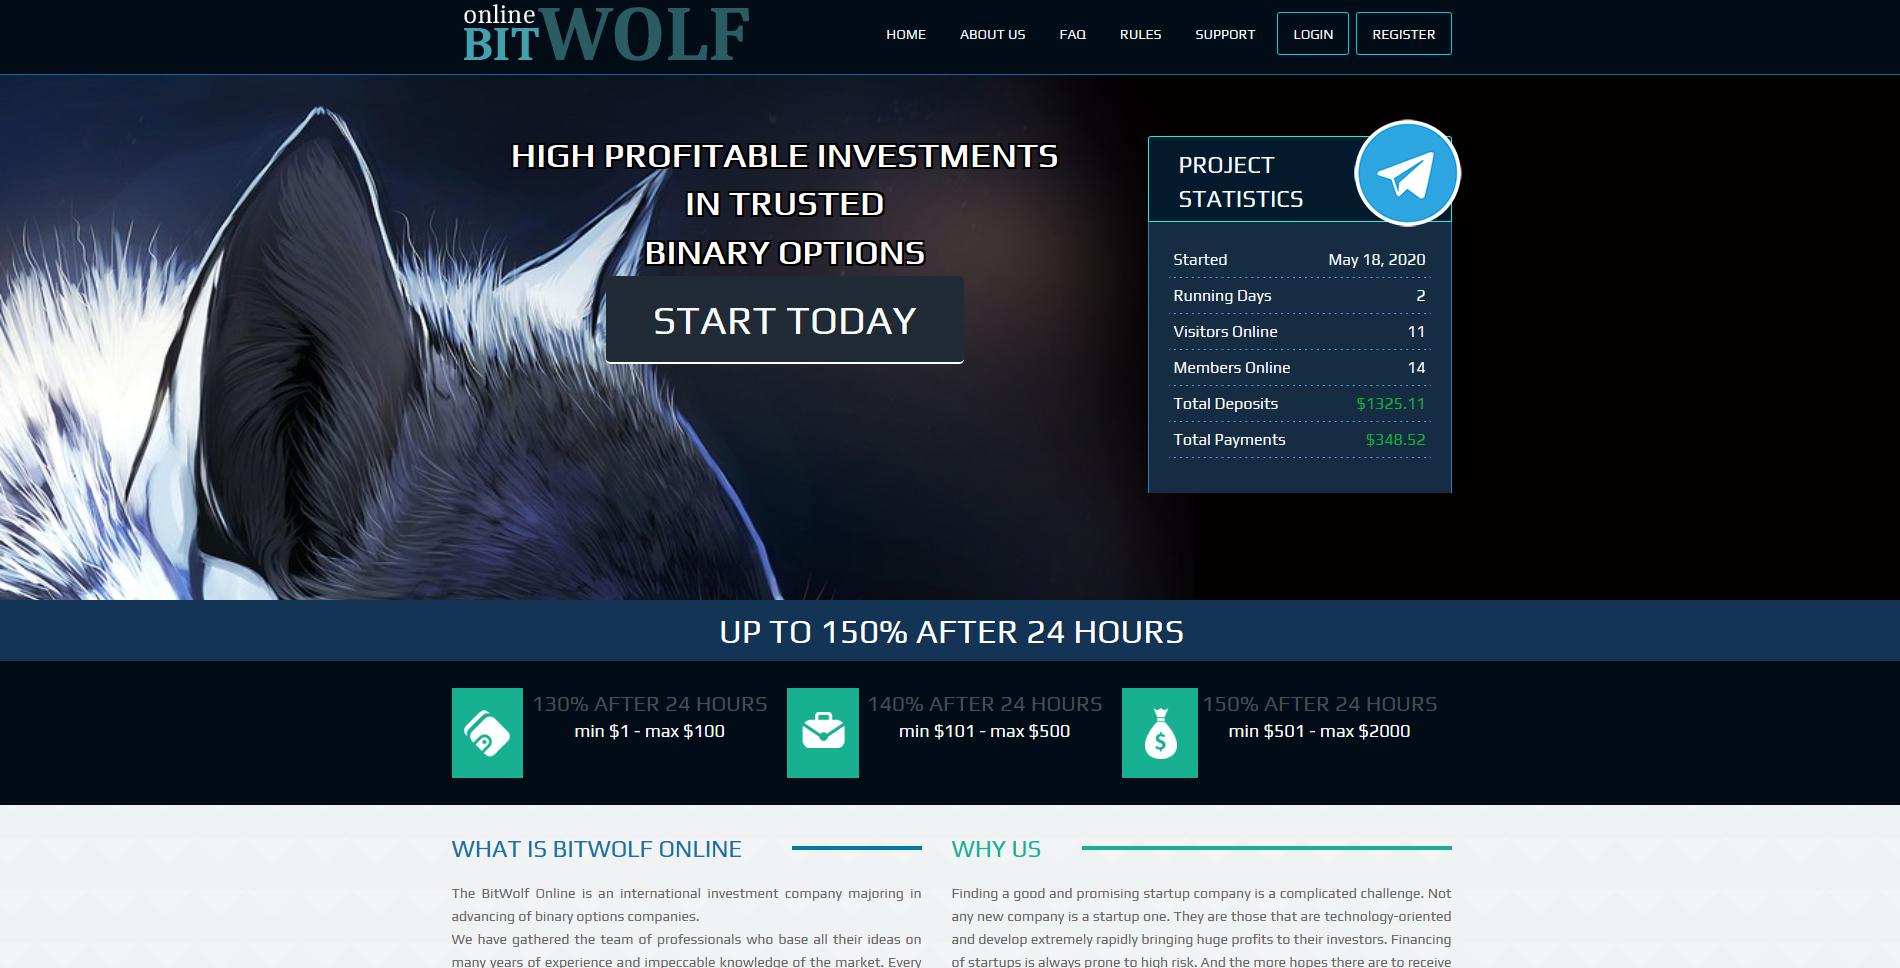 BitWolf